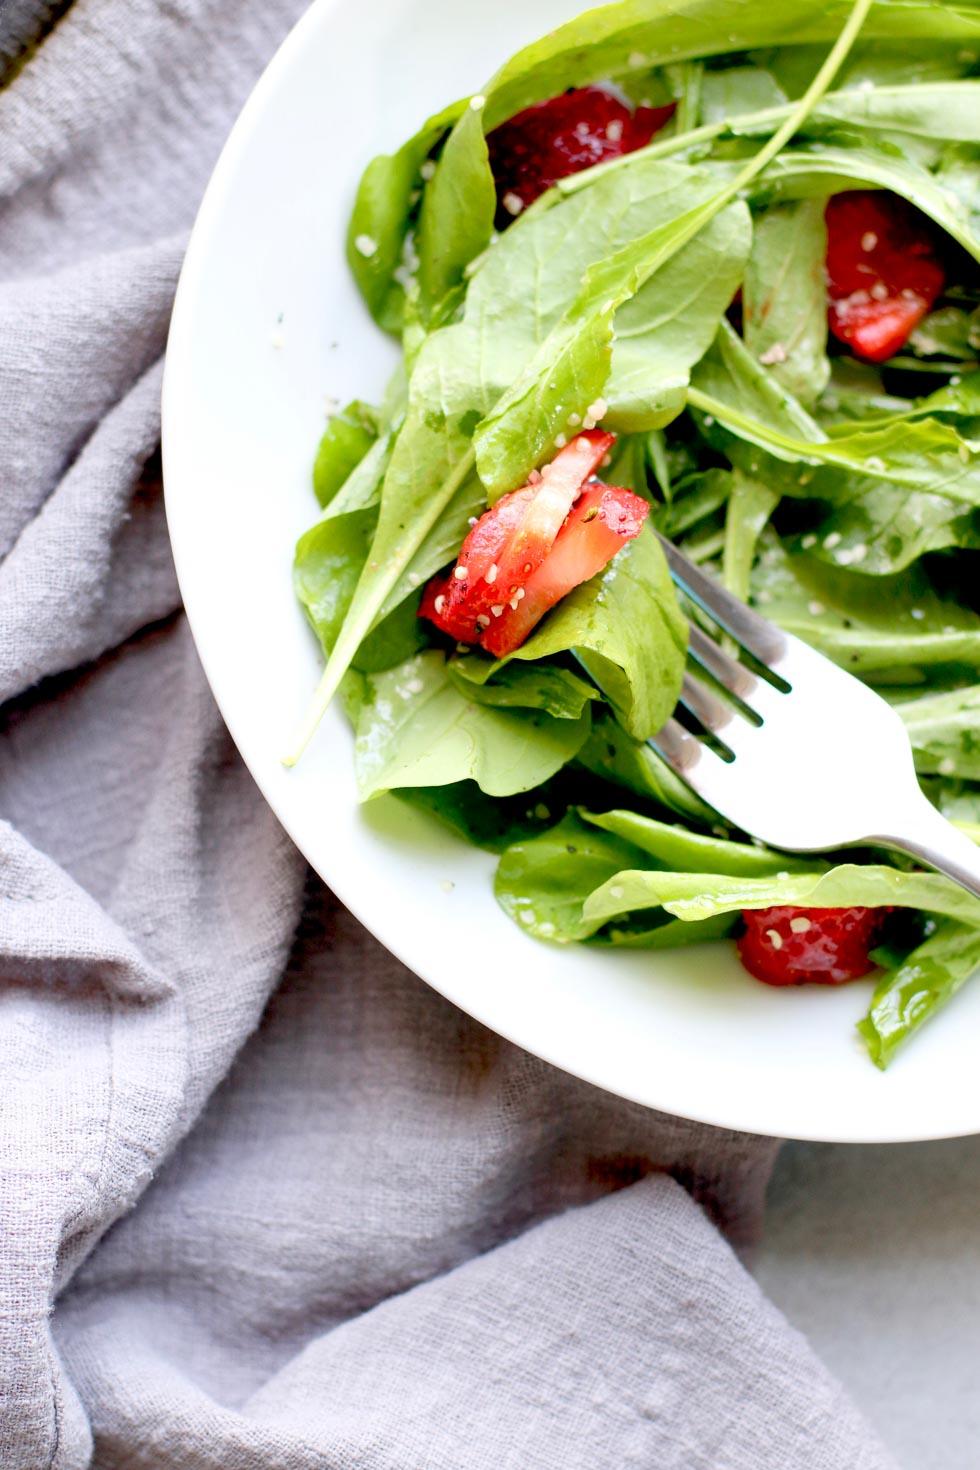 Strawberry Arugula Salad with Hemp Seed First Bite